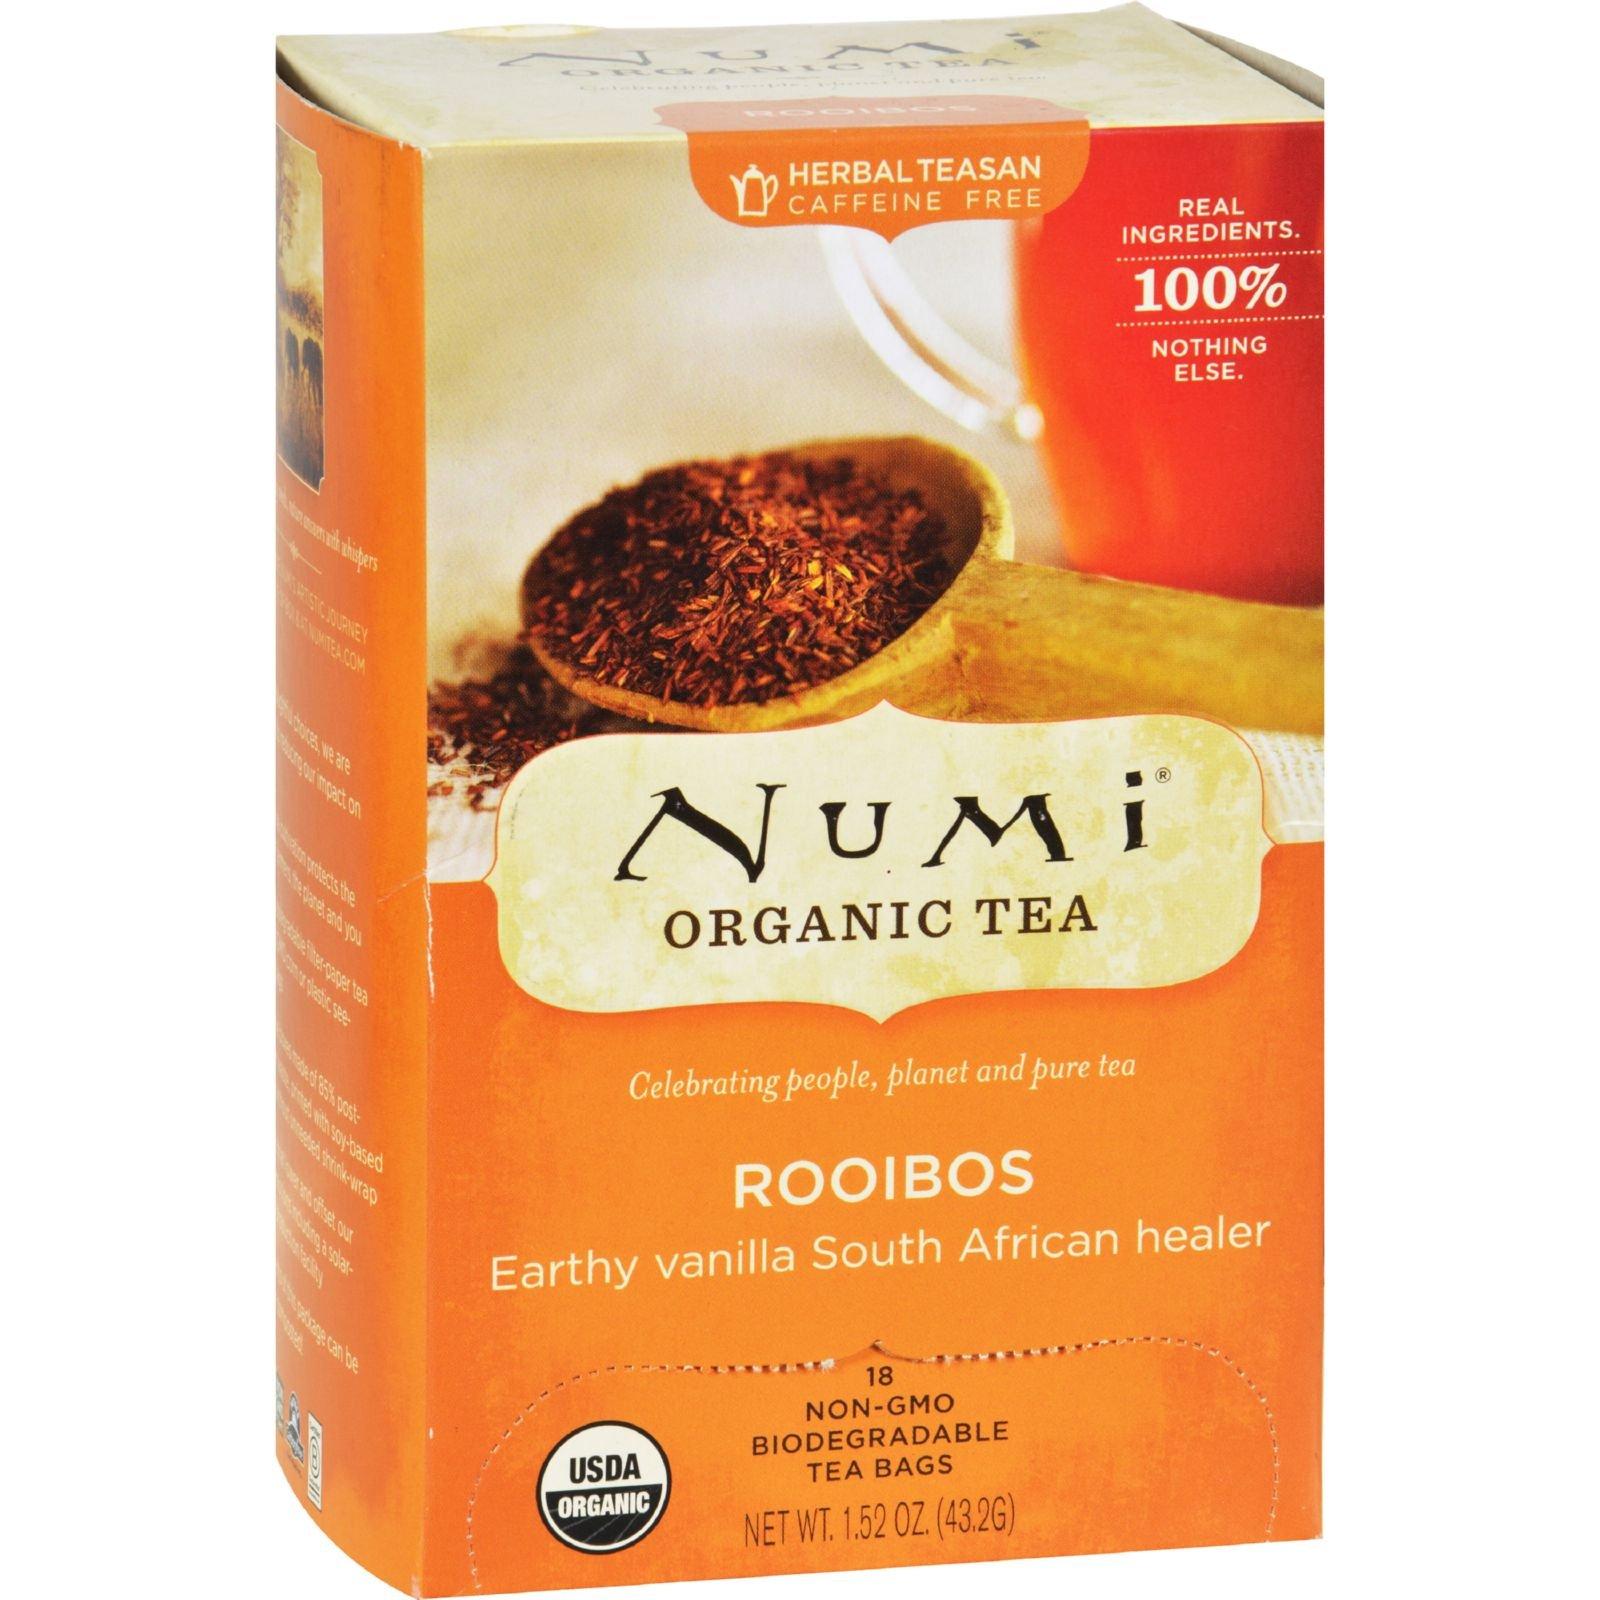 Numi Tea Organic Rooibos - Caffeine Free - 18 Bags - 95%+ Organic - 100% Real Ingredients by Numi (Image #1)